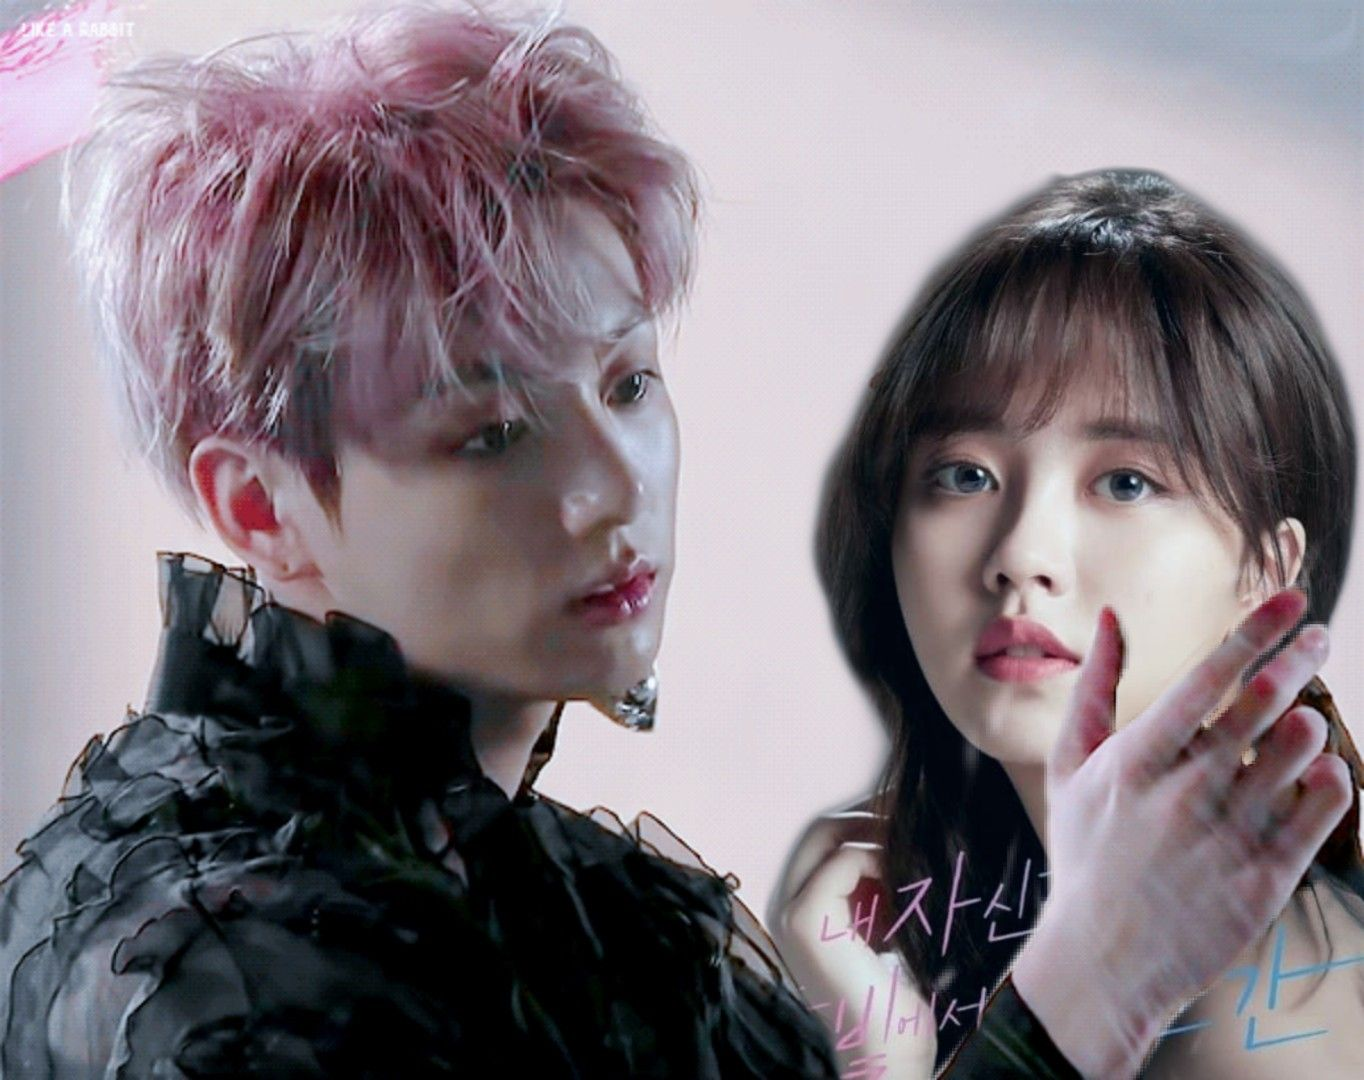 jungkook dating sohyun